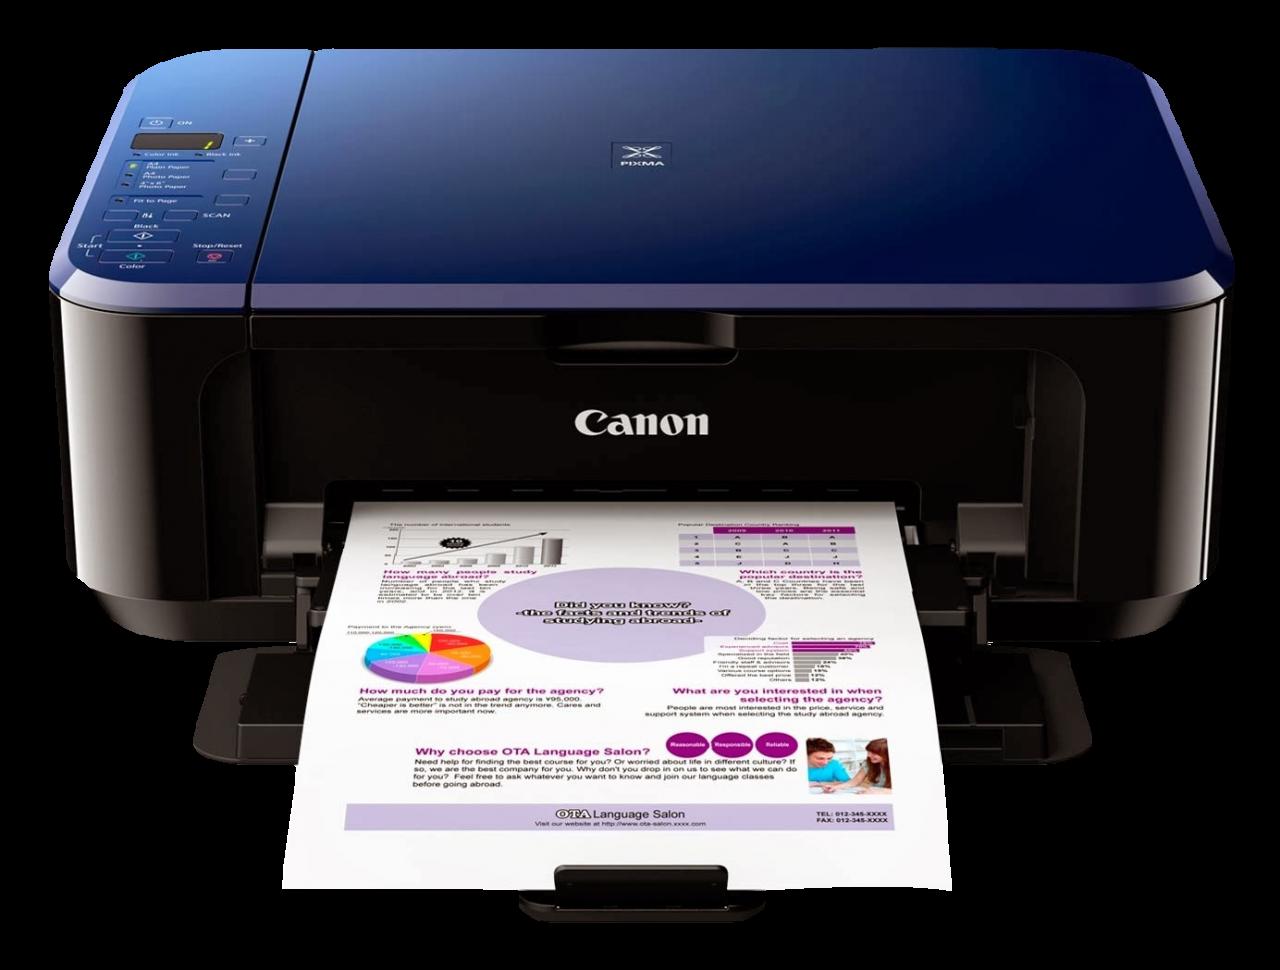 Canon Color Photo Printer PNG Image